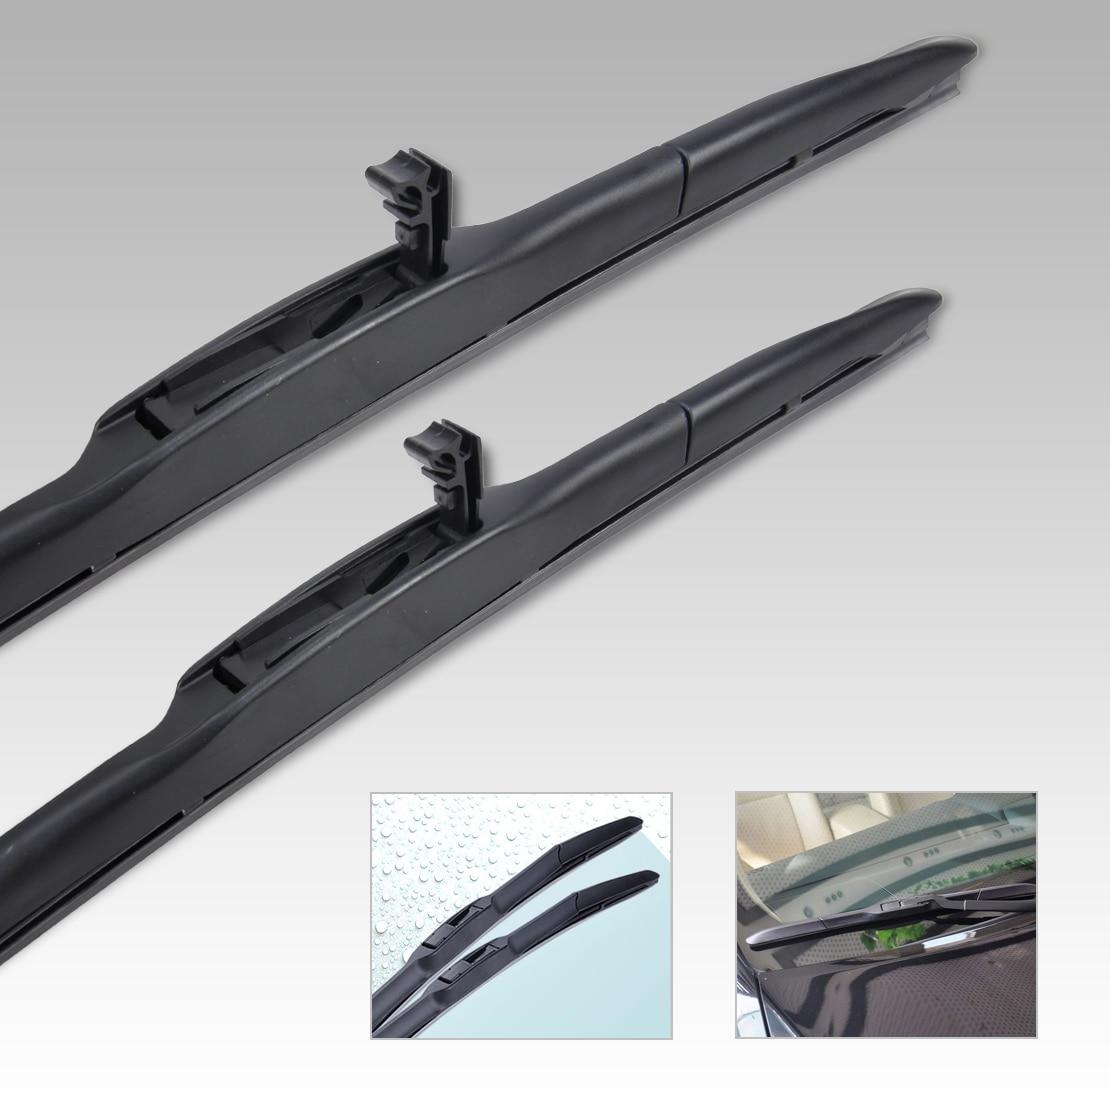 Citall 26 14 hybrid 3 section rubber rain window windshield wiper blade for